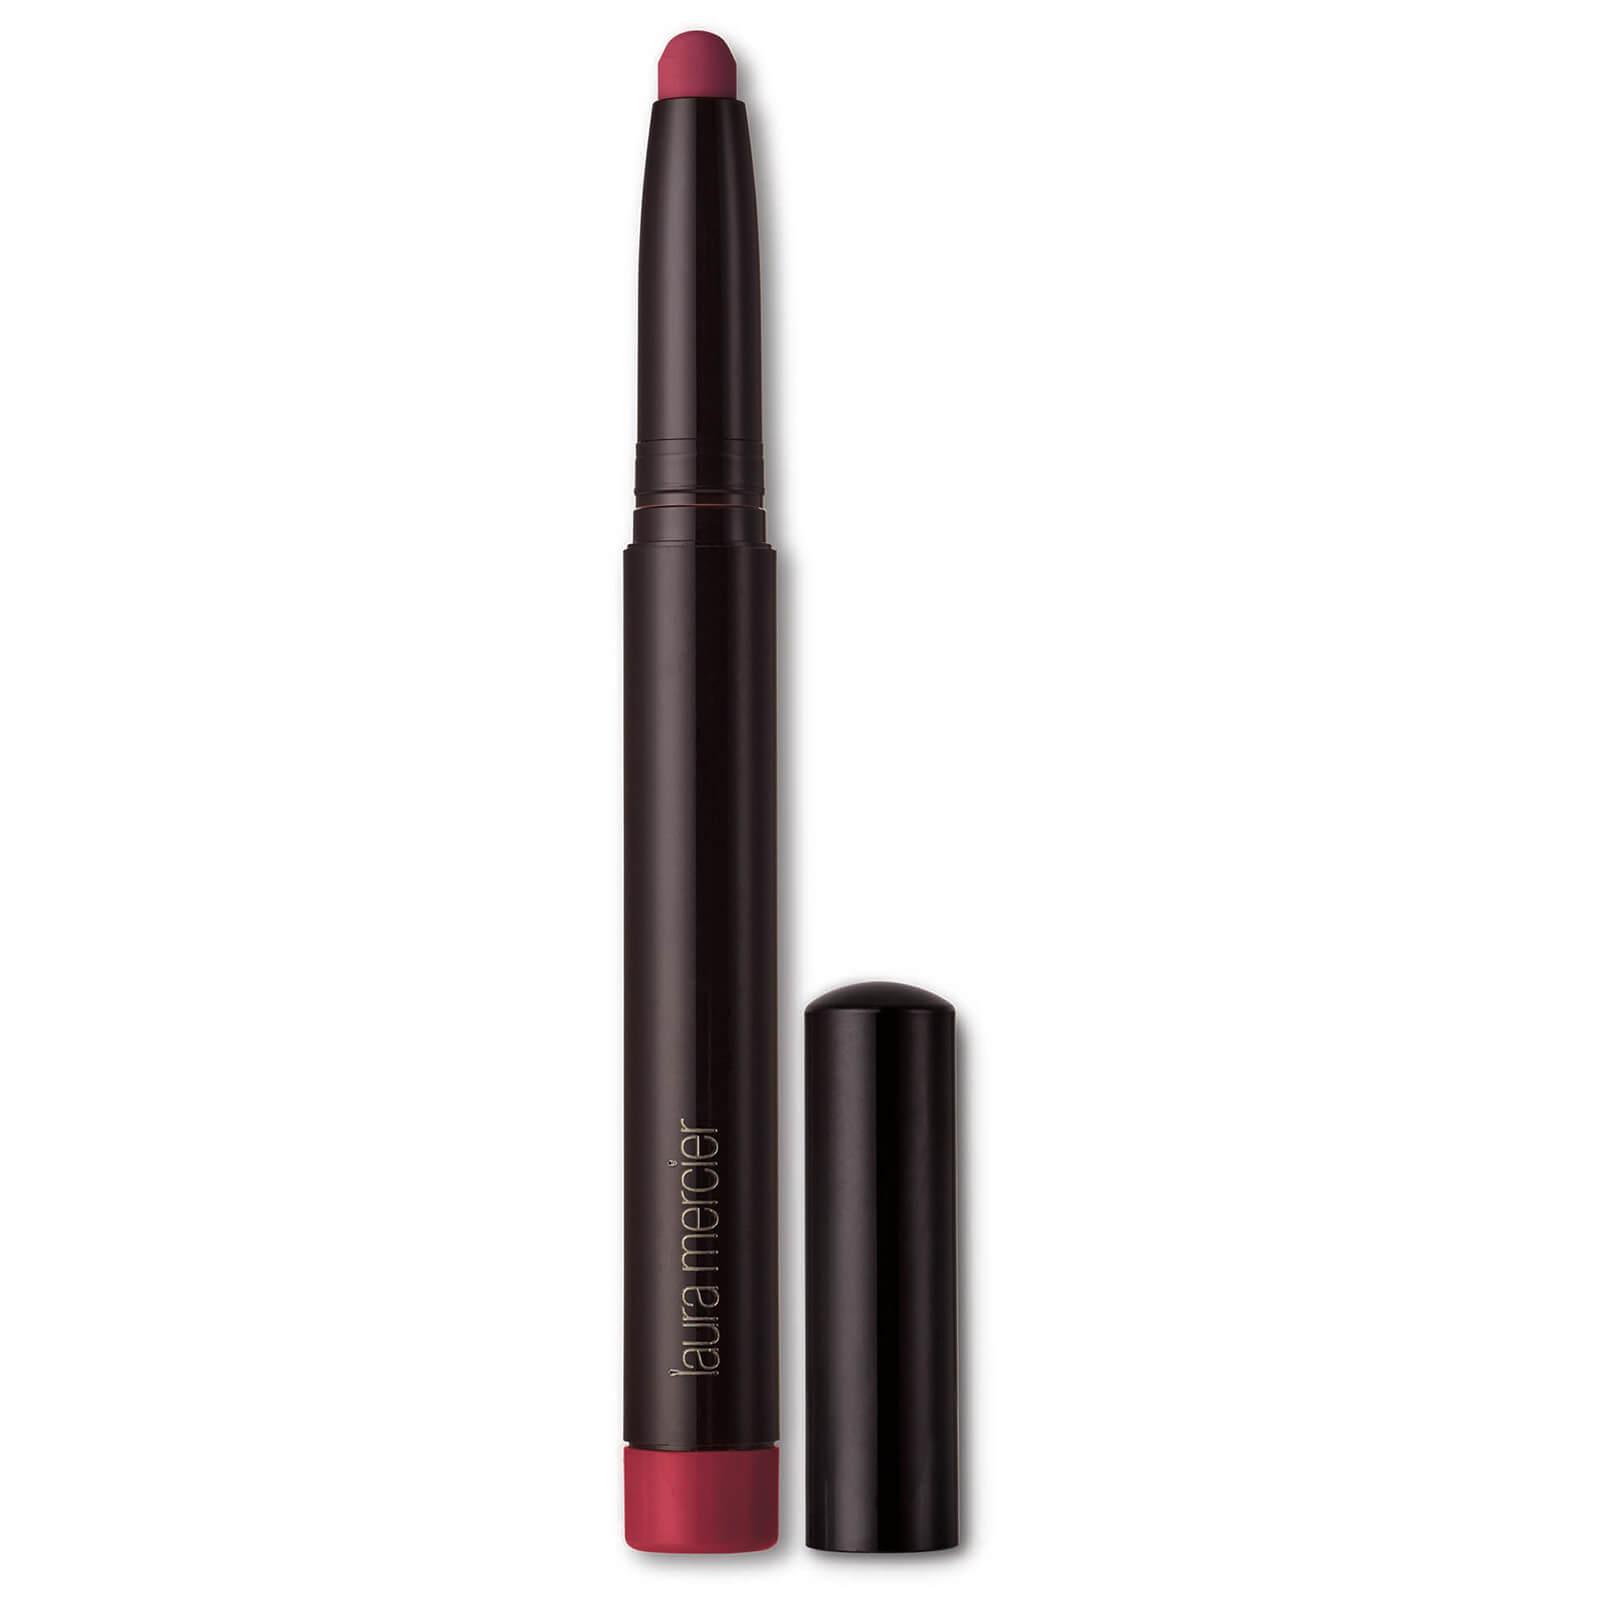 Laura Mercier Velour Extreme Matte Lipstick 1.4g (Various Shades) - Hot